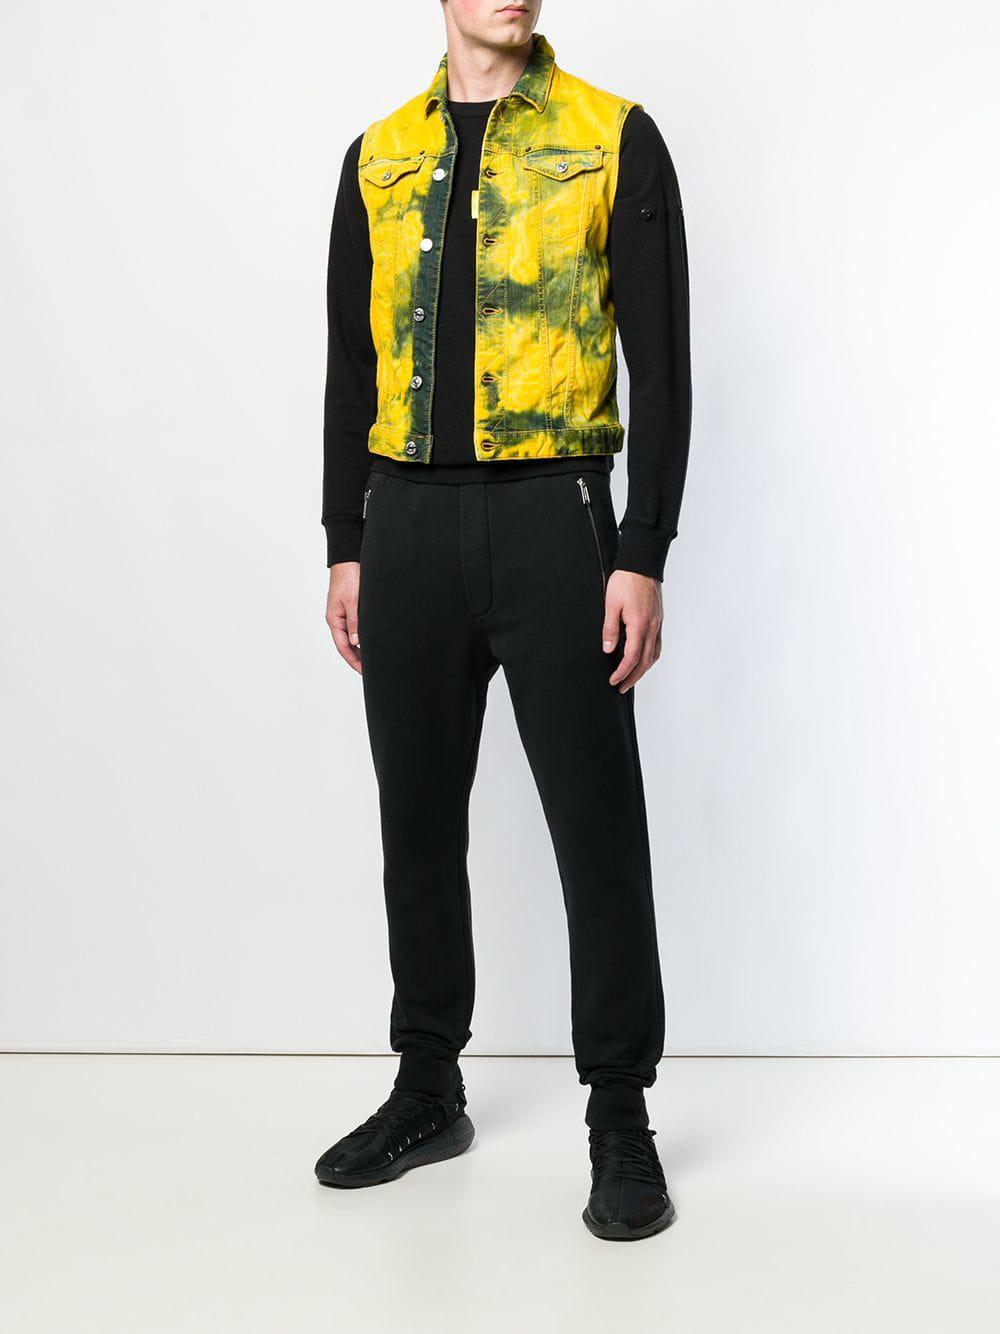 d459b397437788 Lyst - DSquared² Sleeveless Denim Jacket in Yellow for Men